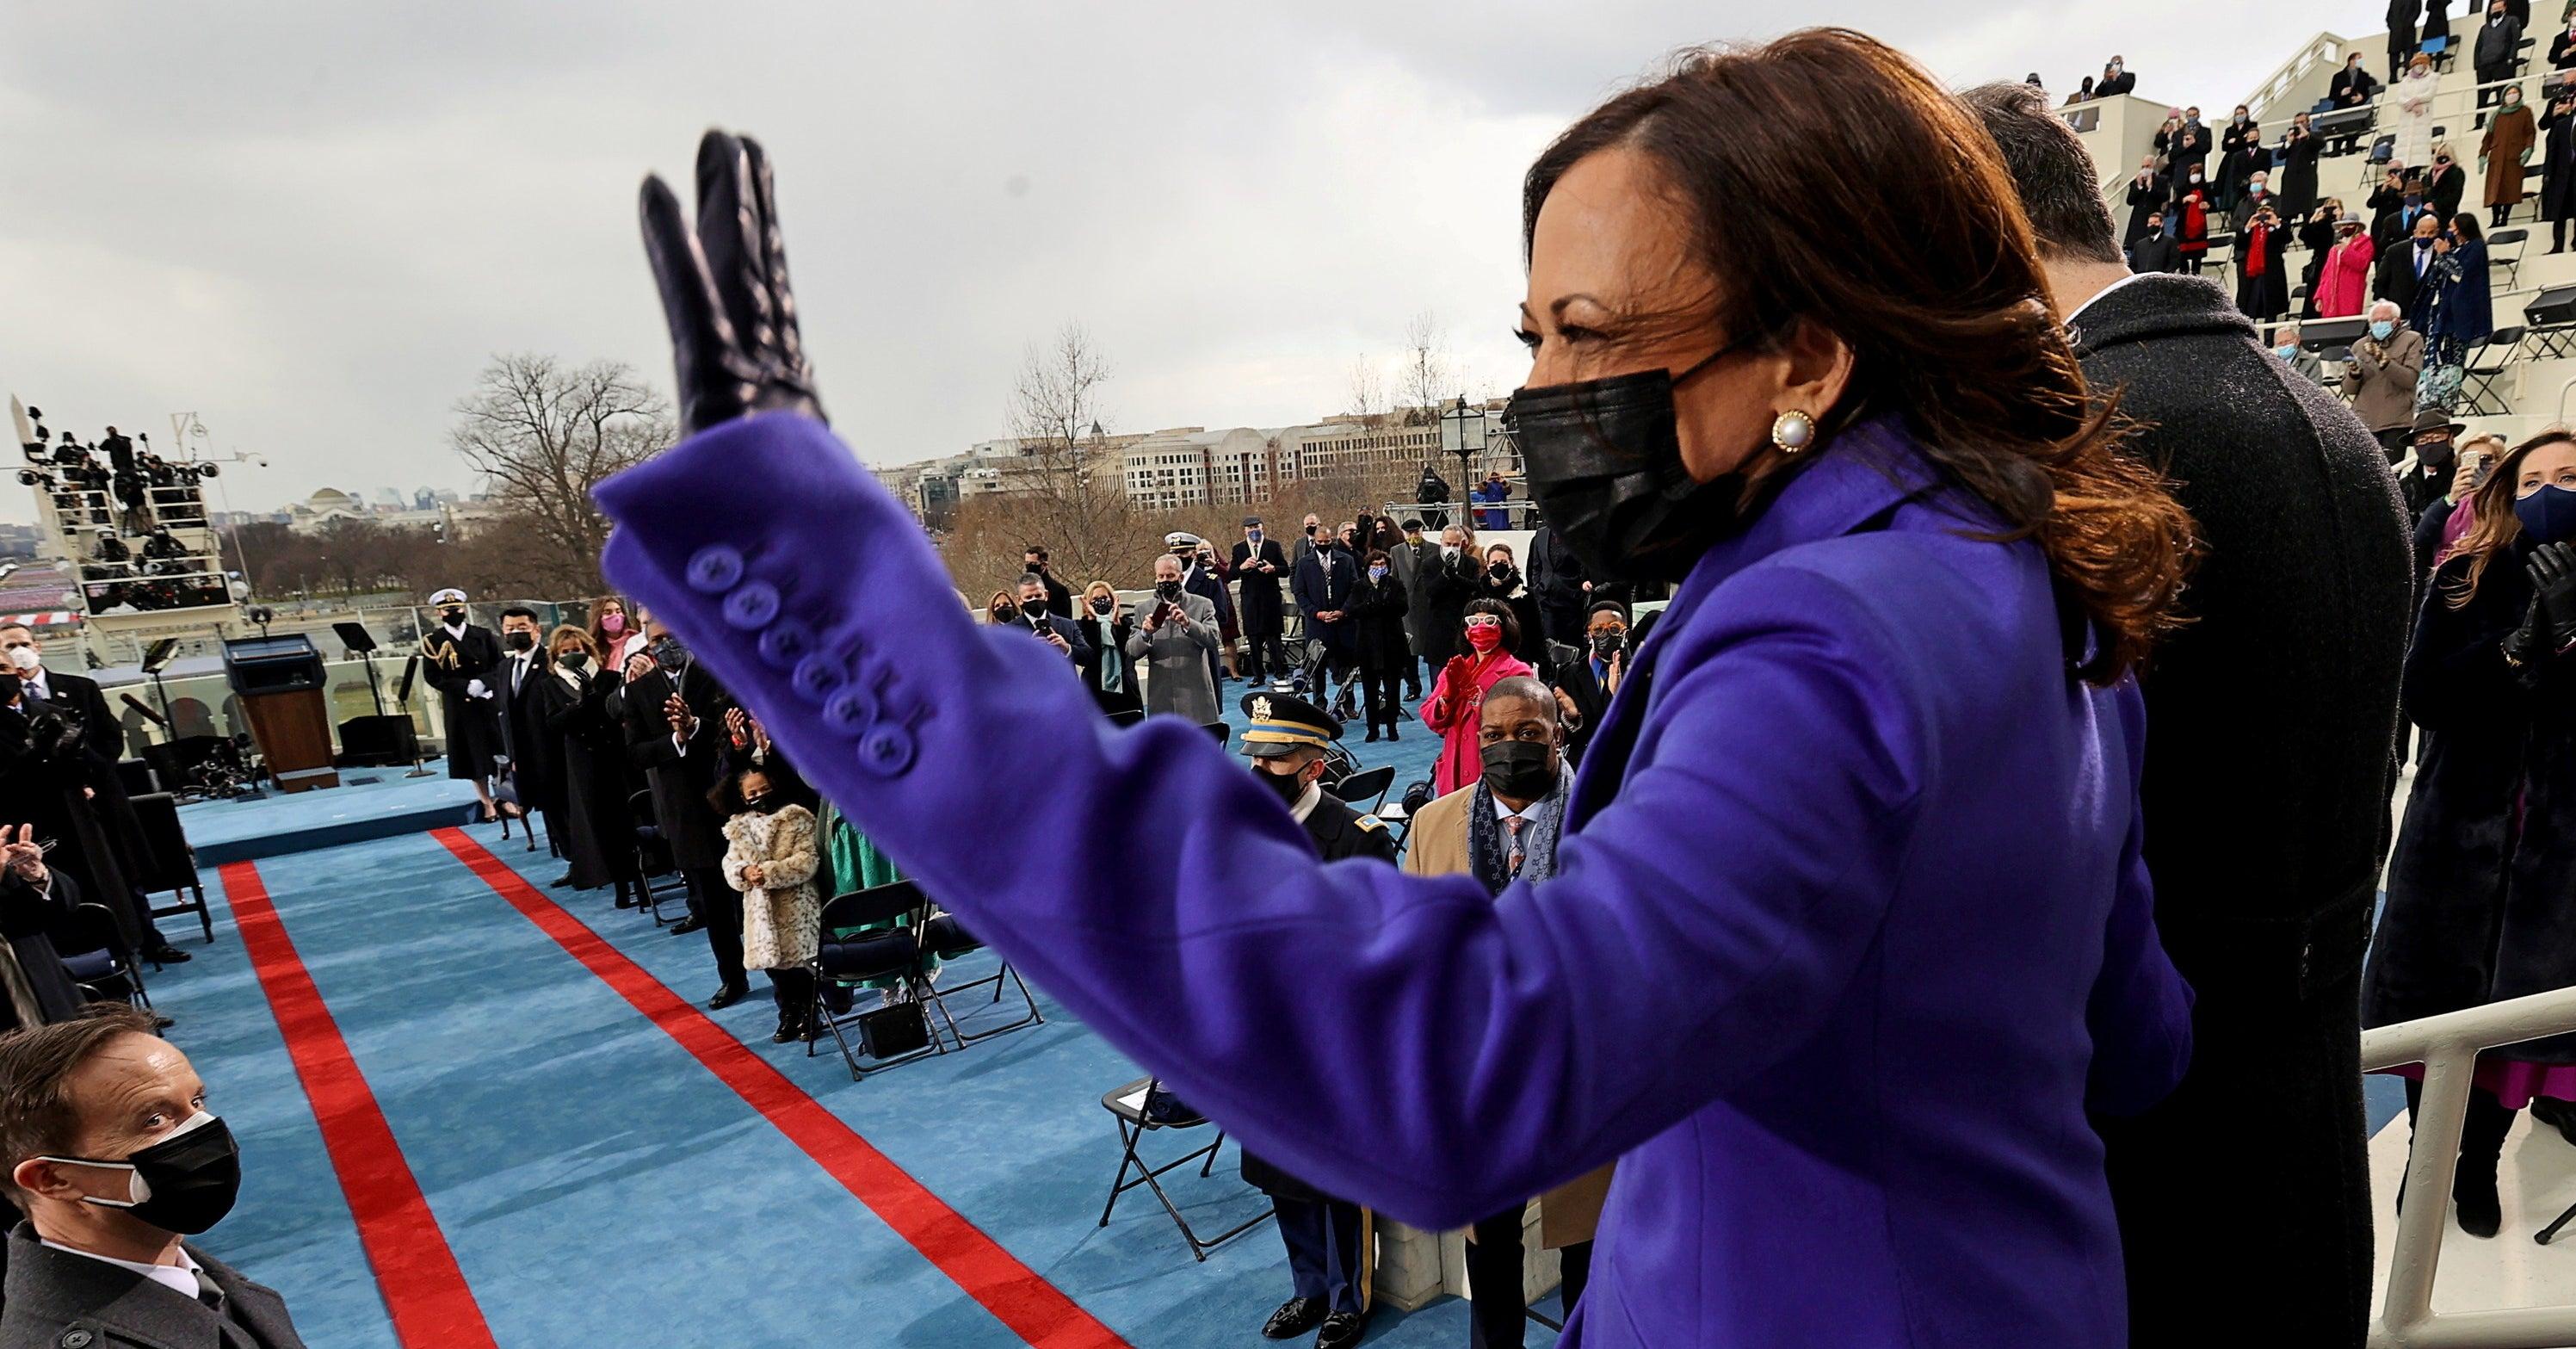 The Best Photos From The Inauguration Of Joe Biden And Kamala Harris